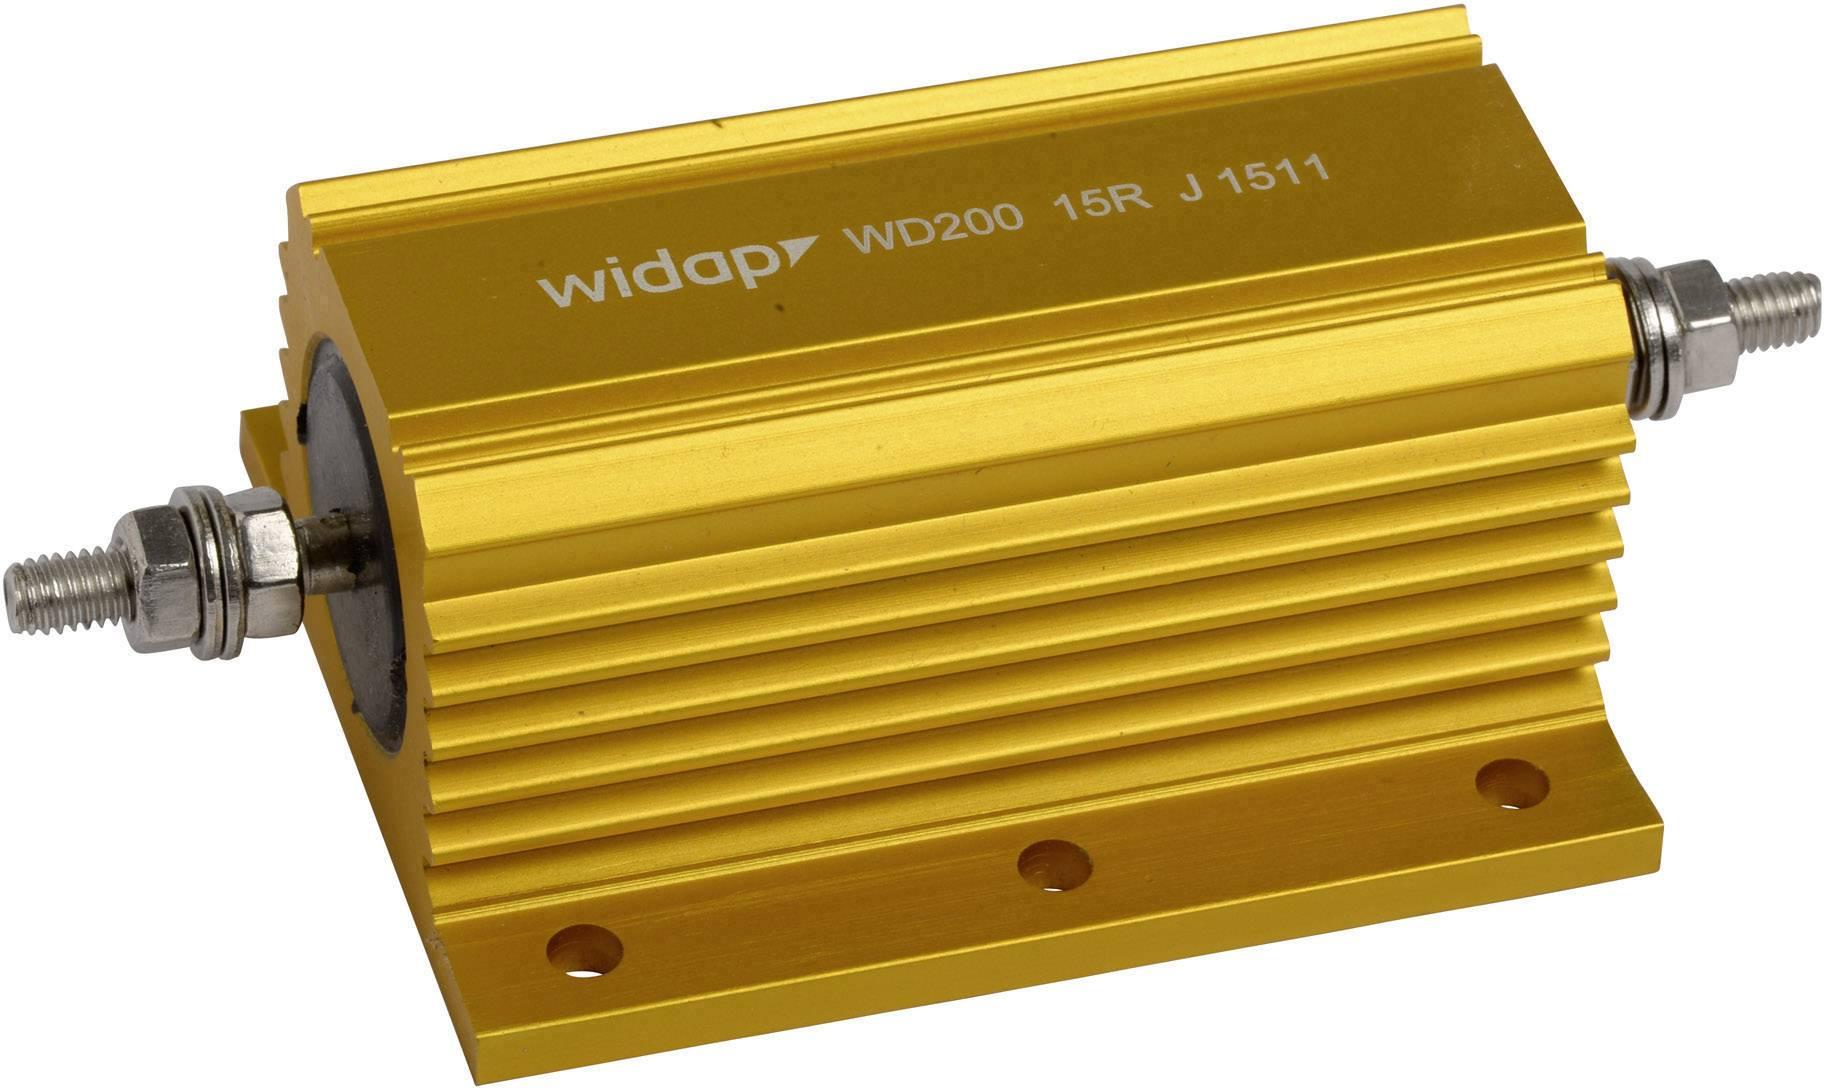 Drôtový rezistor Widap 160155, hodnota odporu 68 Ohm, 200 W, 1 ks